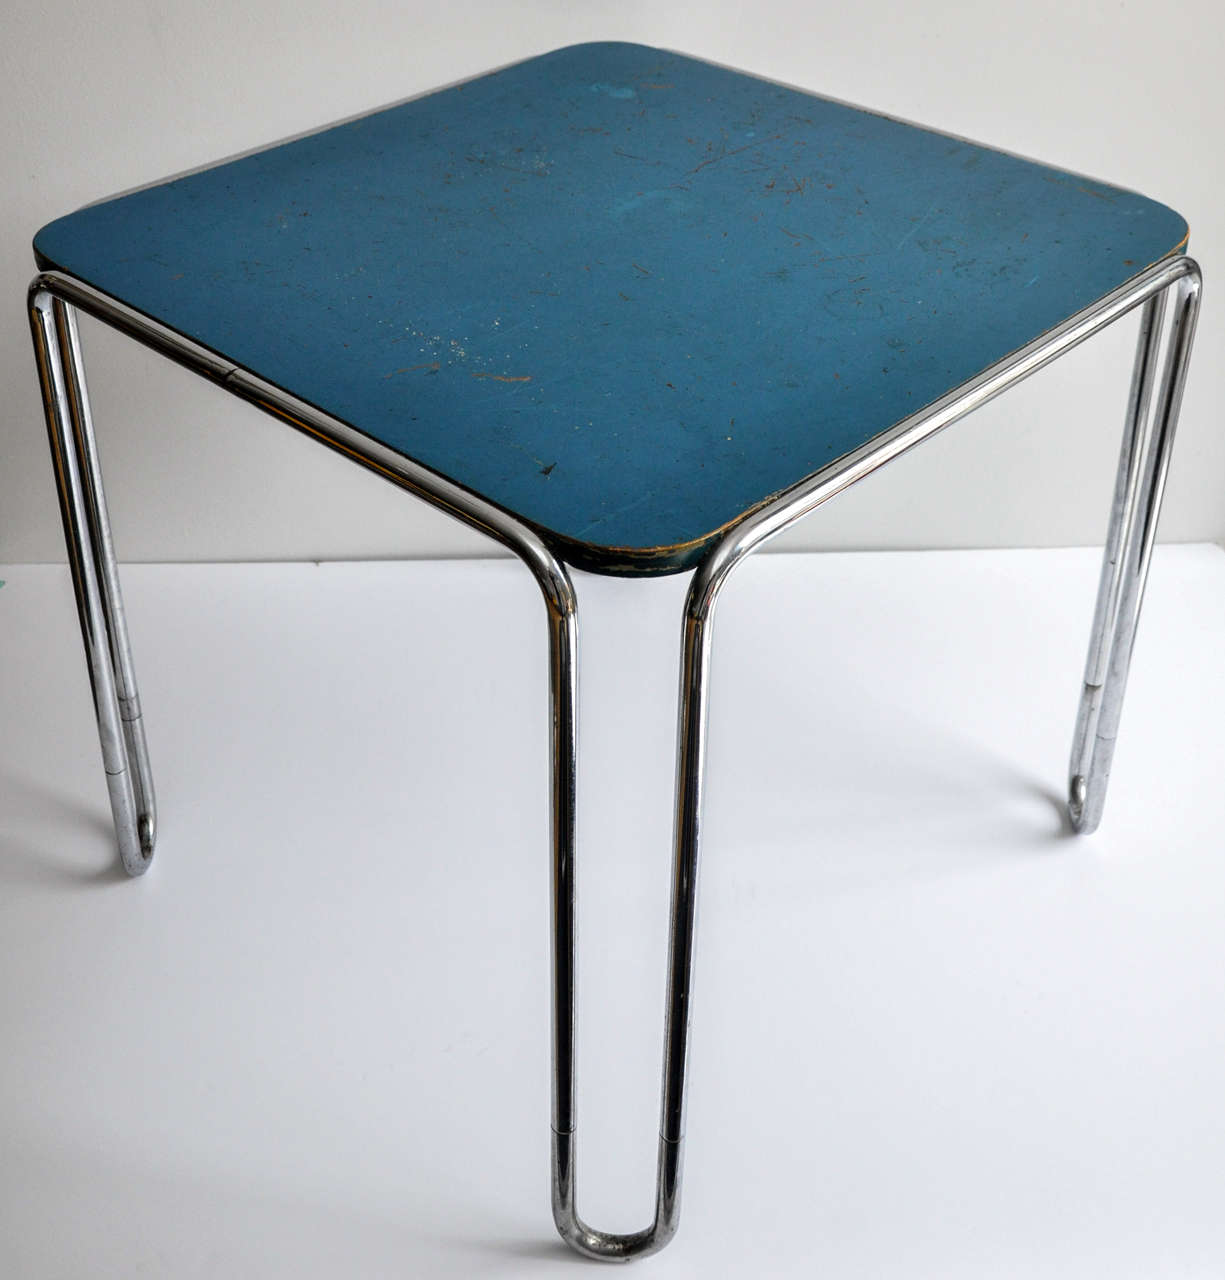 Tubular Steel Table B10 By Marcel Breuer/ Bauhaus 3